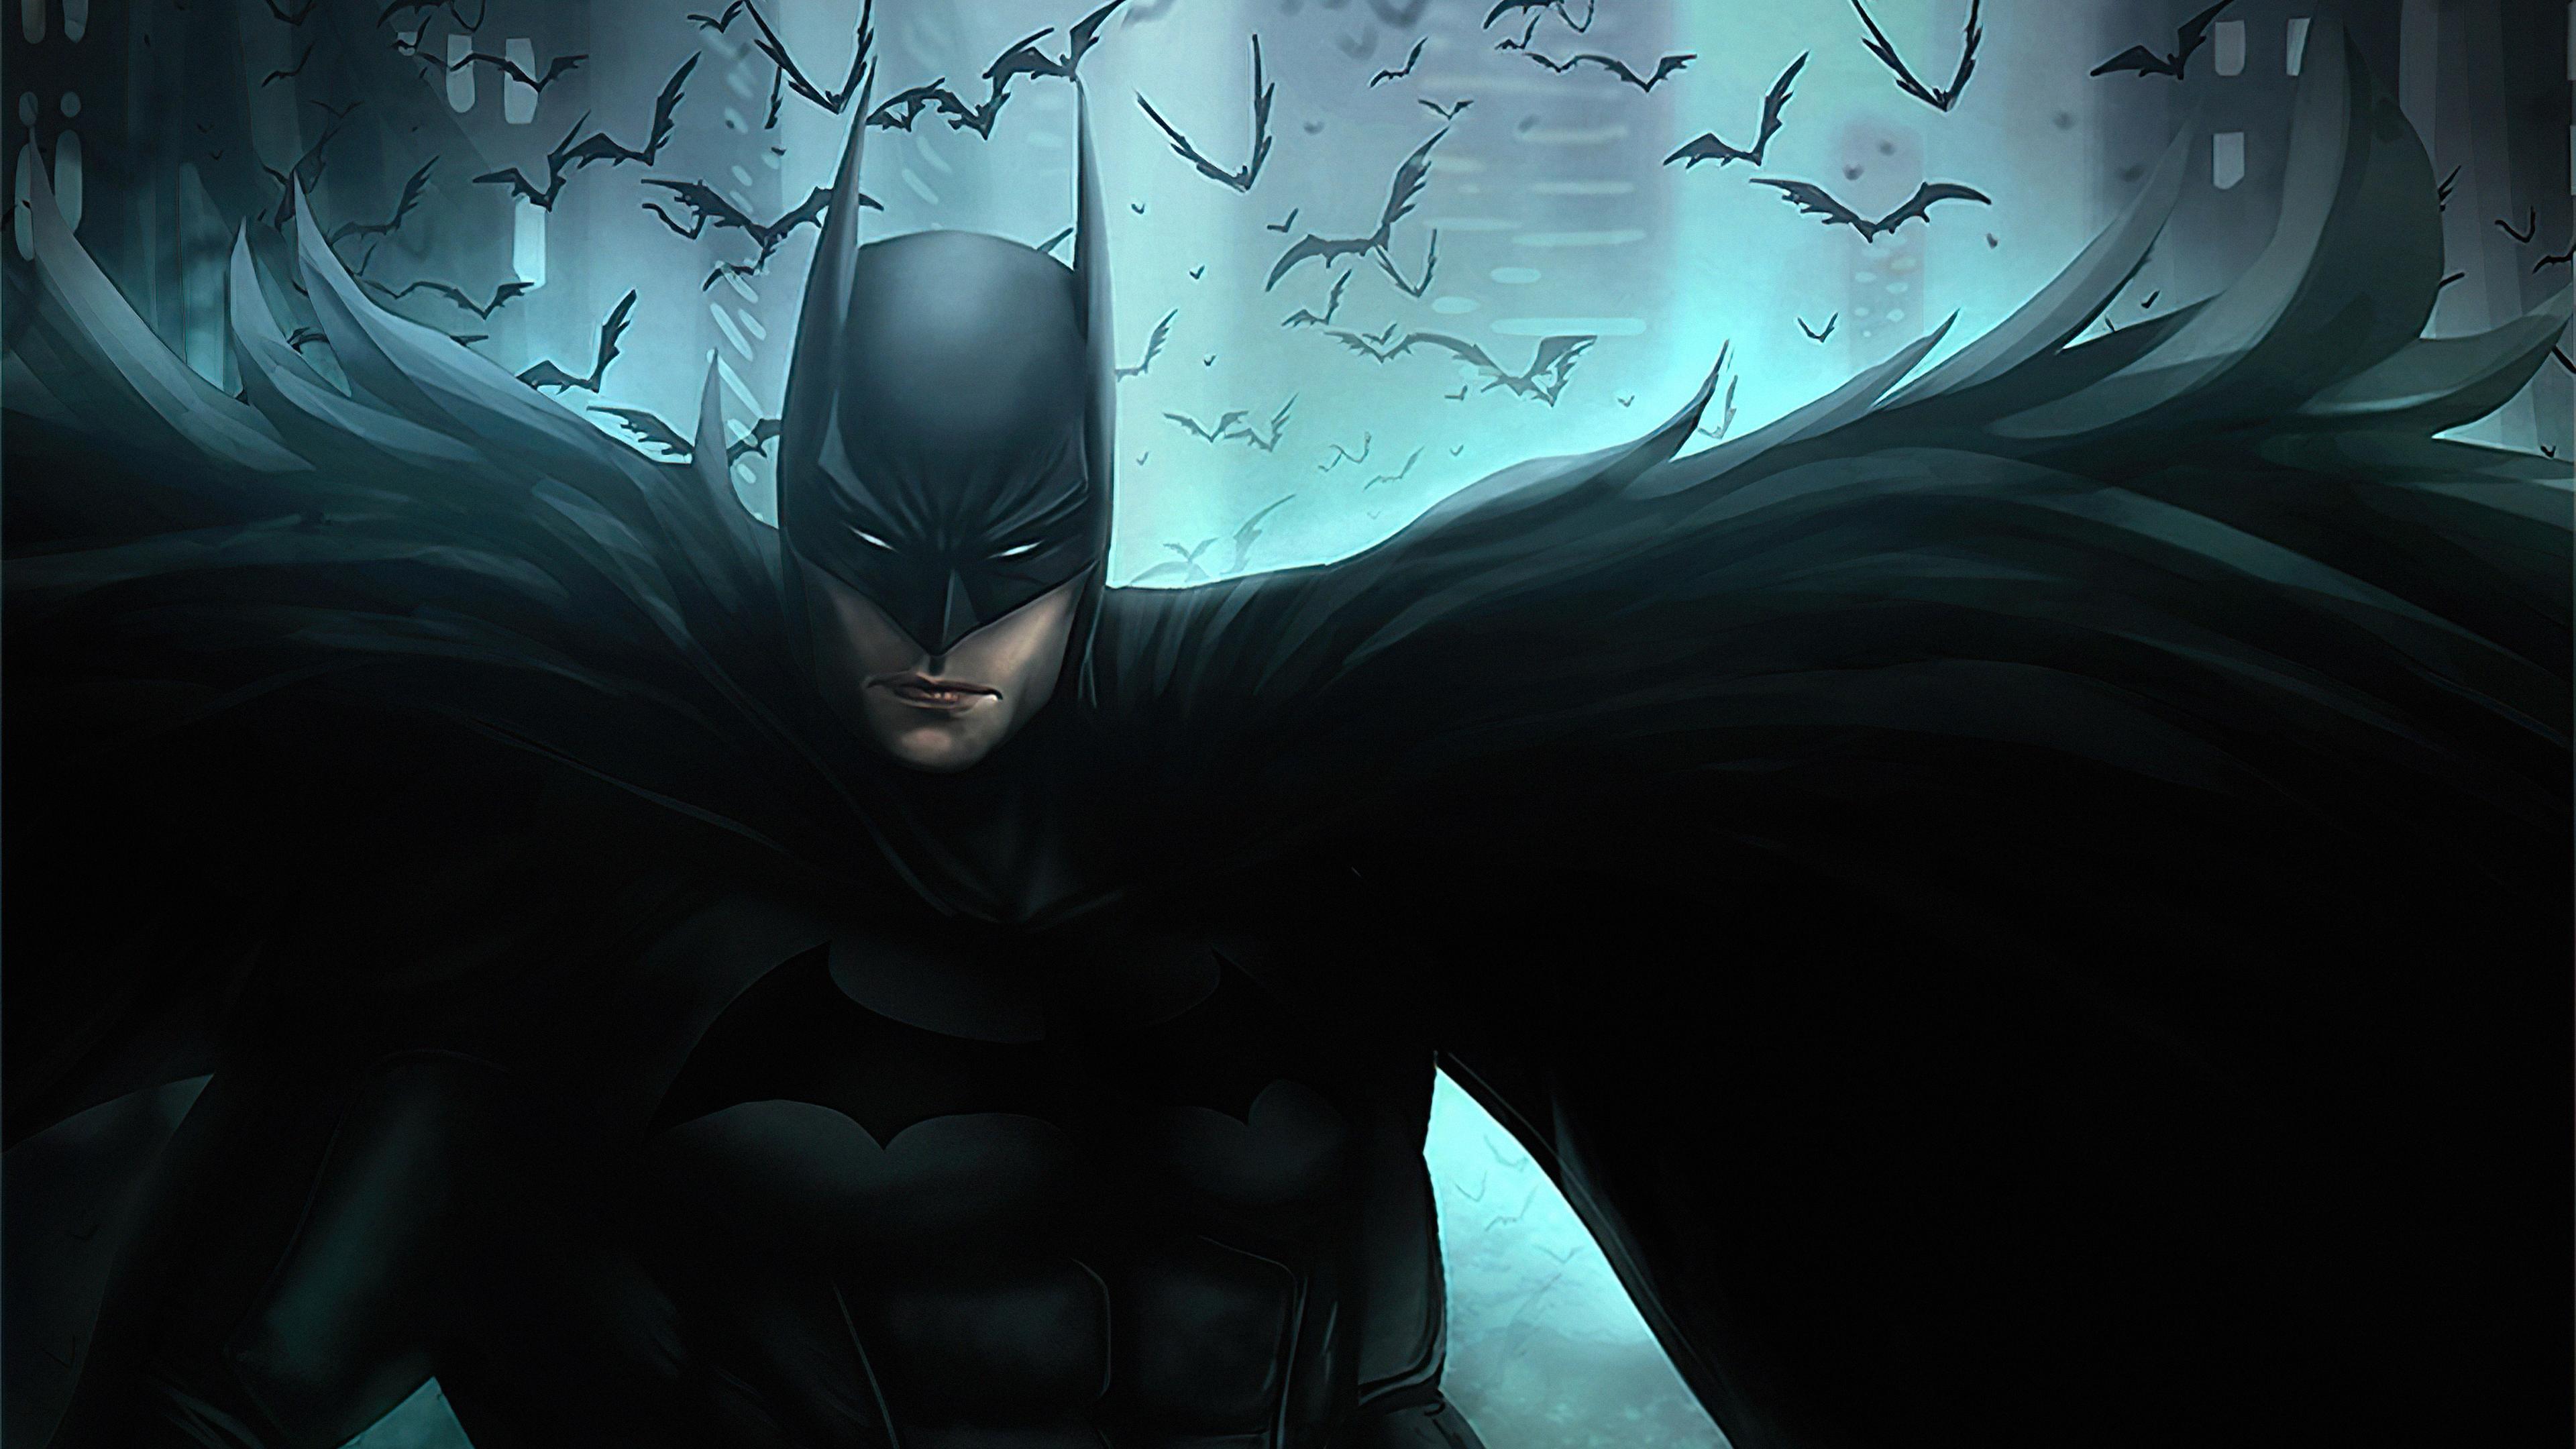 breaking into smaller bats 4k 1616961540 - Breaking Into Smaller Bats 4k - Breaking Into Smaller Bats 4k wallpapers